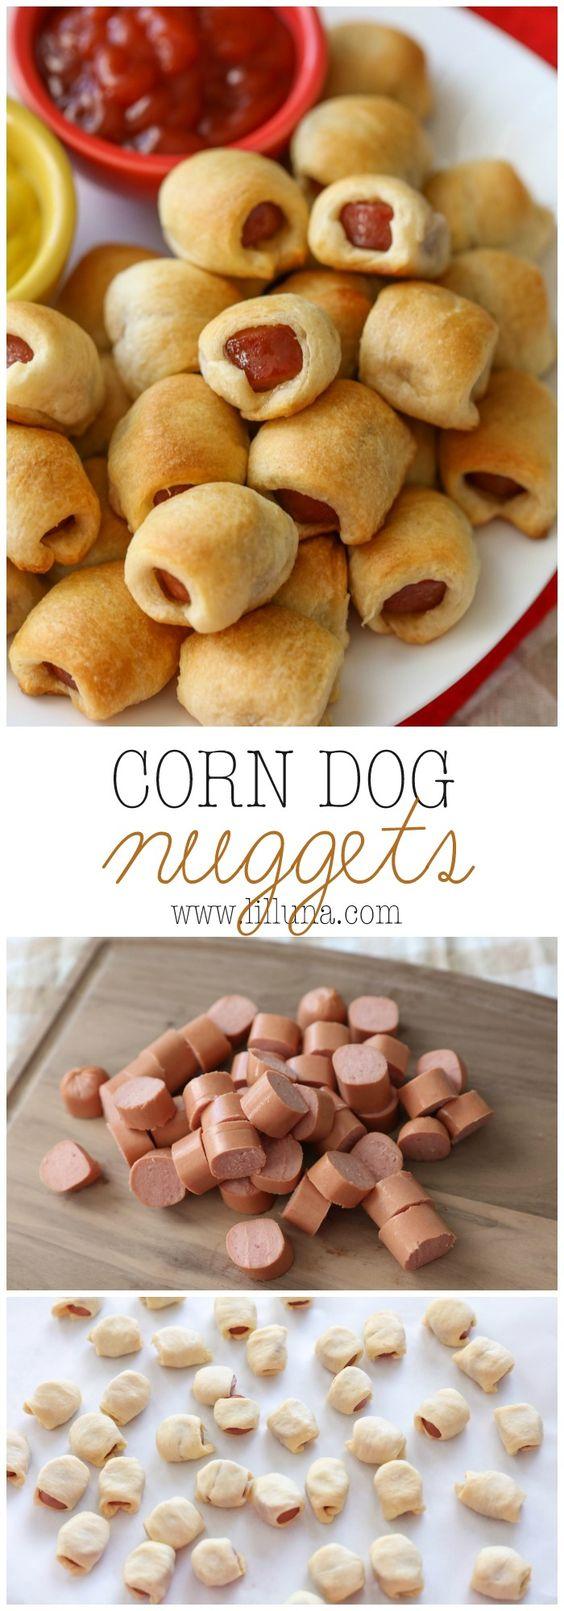 Hot Dog Nuggets Recipe